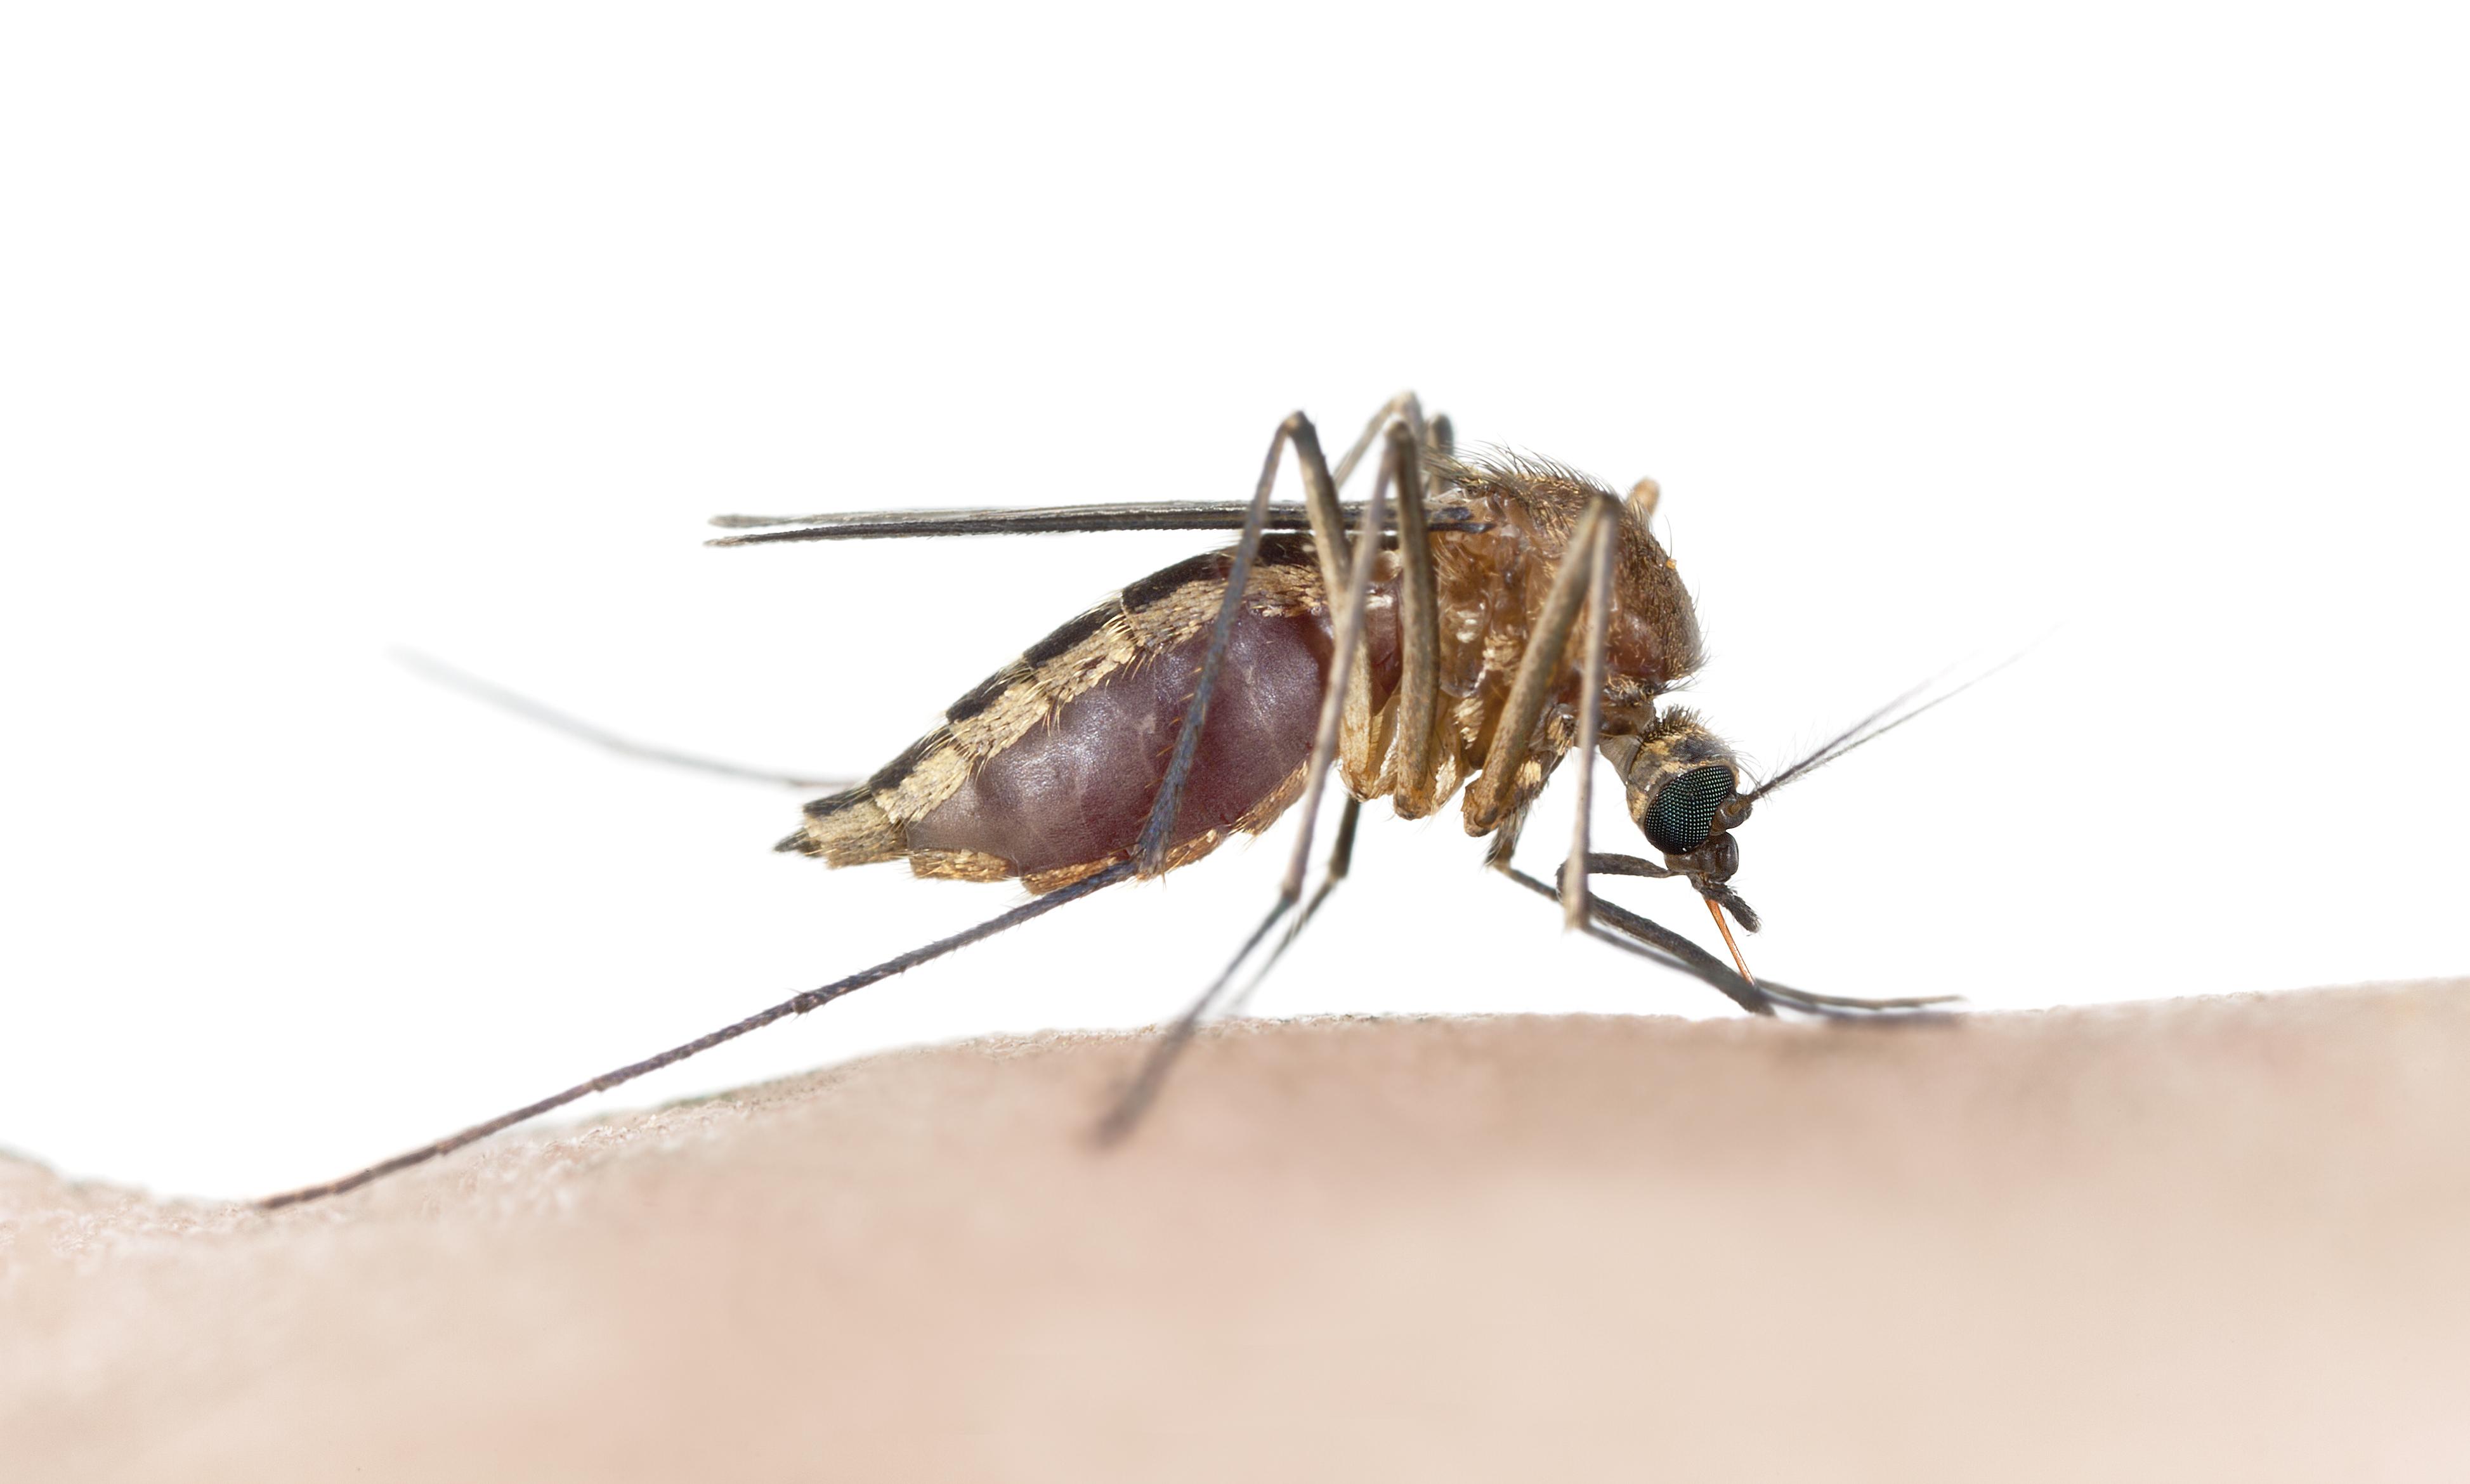 Bed bugs bites vs mosquito bites